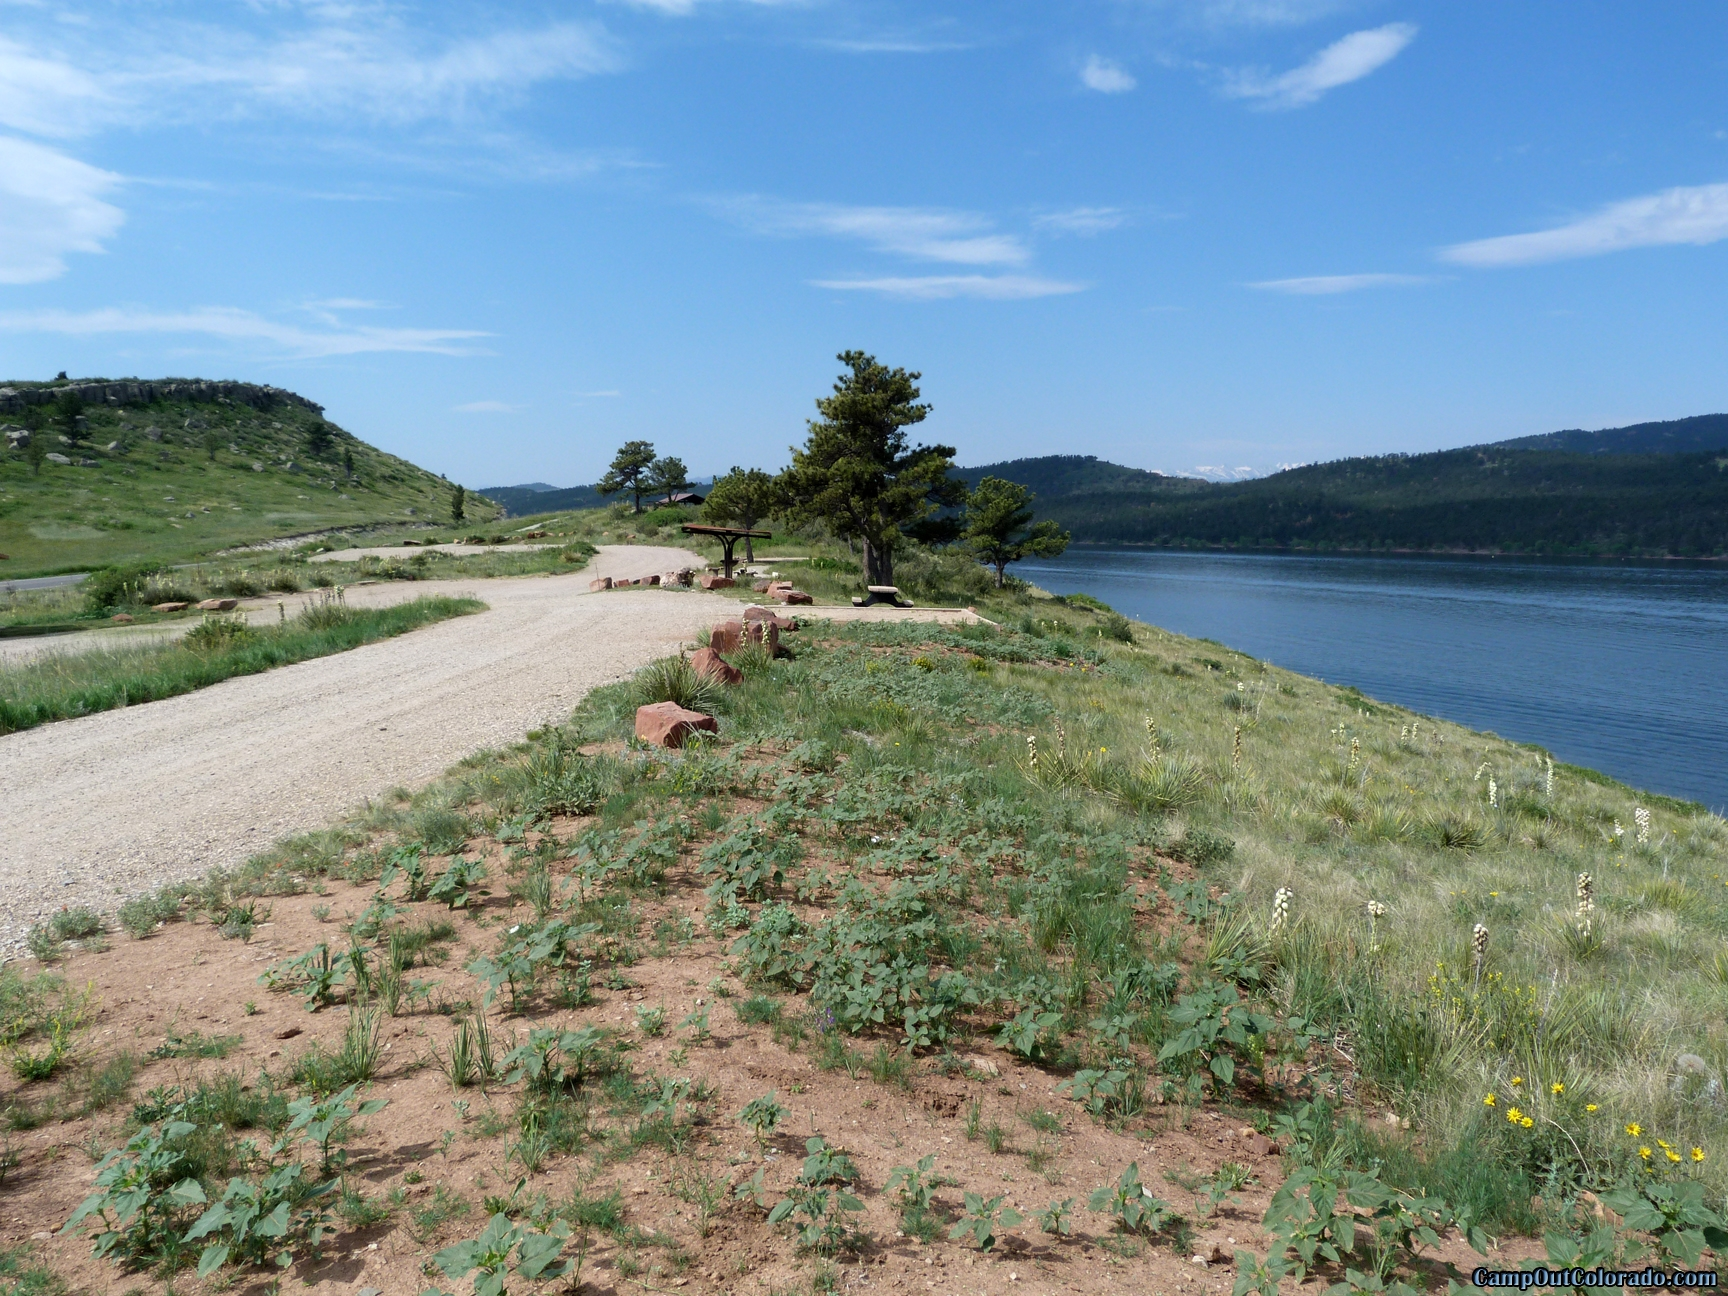 camp-out-colorado-carter-lake-lakesie-lineup